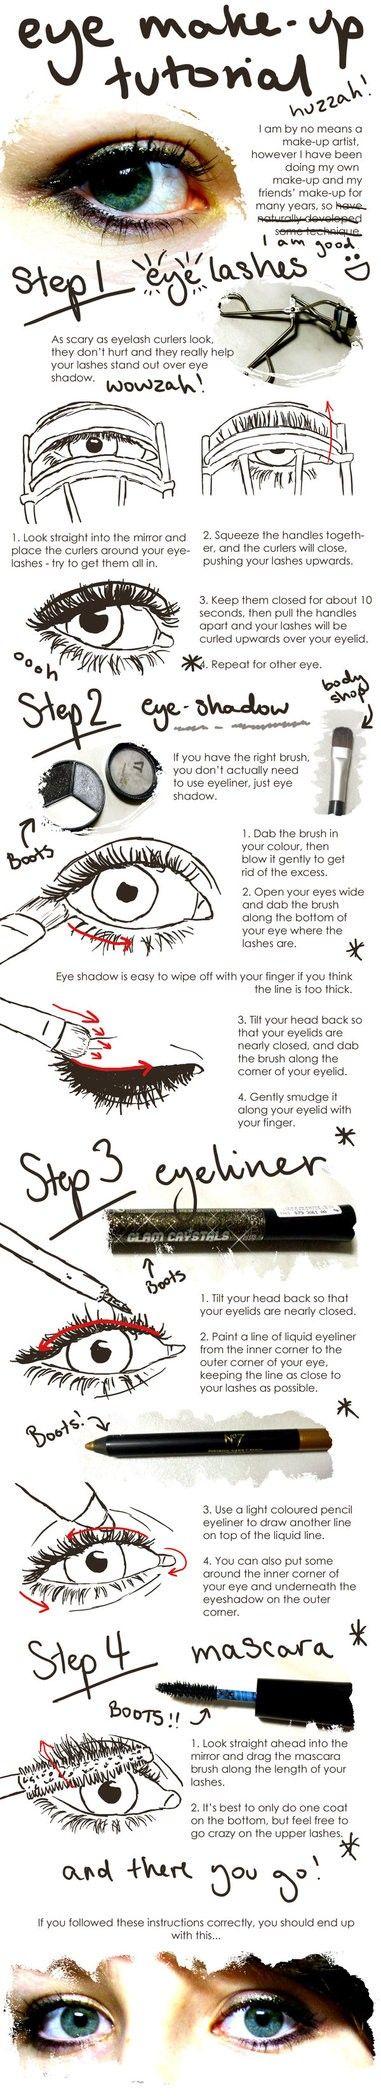 : Make Up Tutorial, Beauty Tips, Eye Tutorial, Makeup Beauty, Eyemakeup, Eye Make Up, Hair, Eye Makeup Tutorials